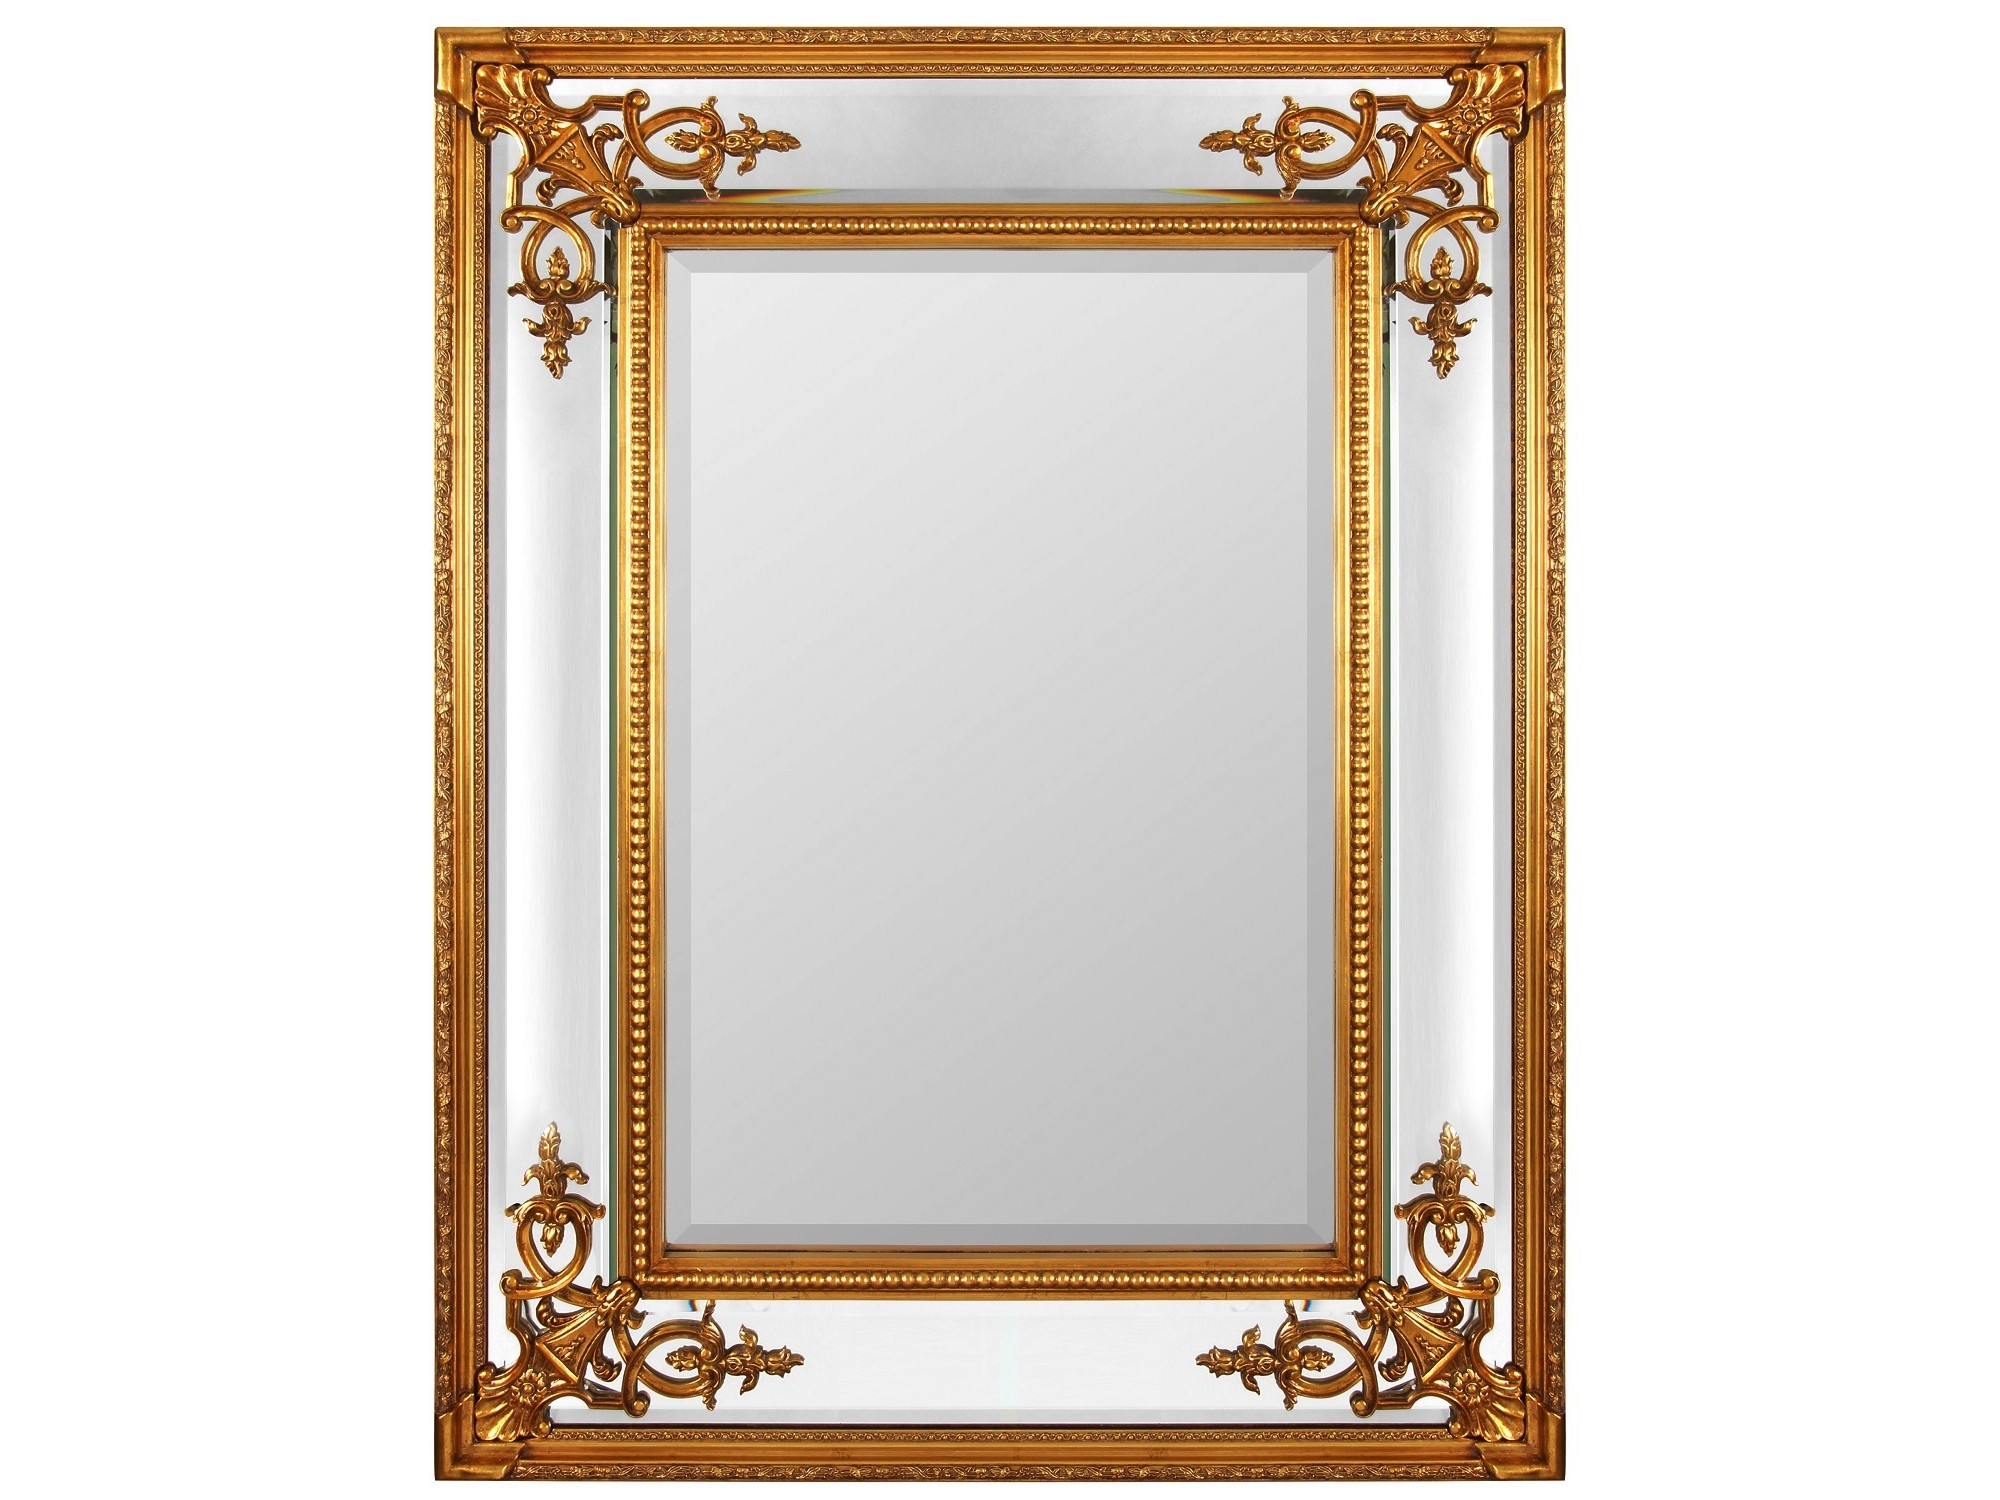 Зеркало LordНастенные зеркала<br><br><br>Material: Полирезин<br>Ширина см: 89.0<br>Высота см: 119.0<br>Глубина см: 4.0